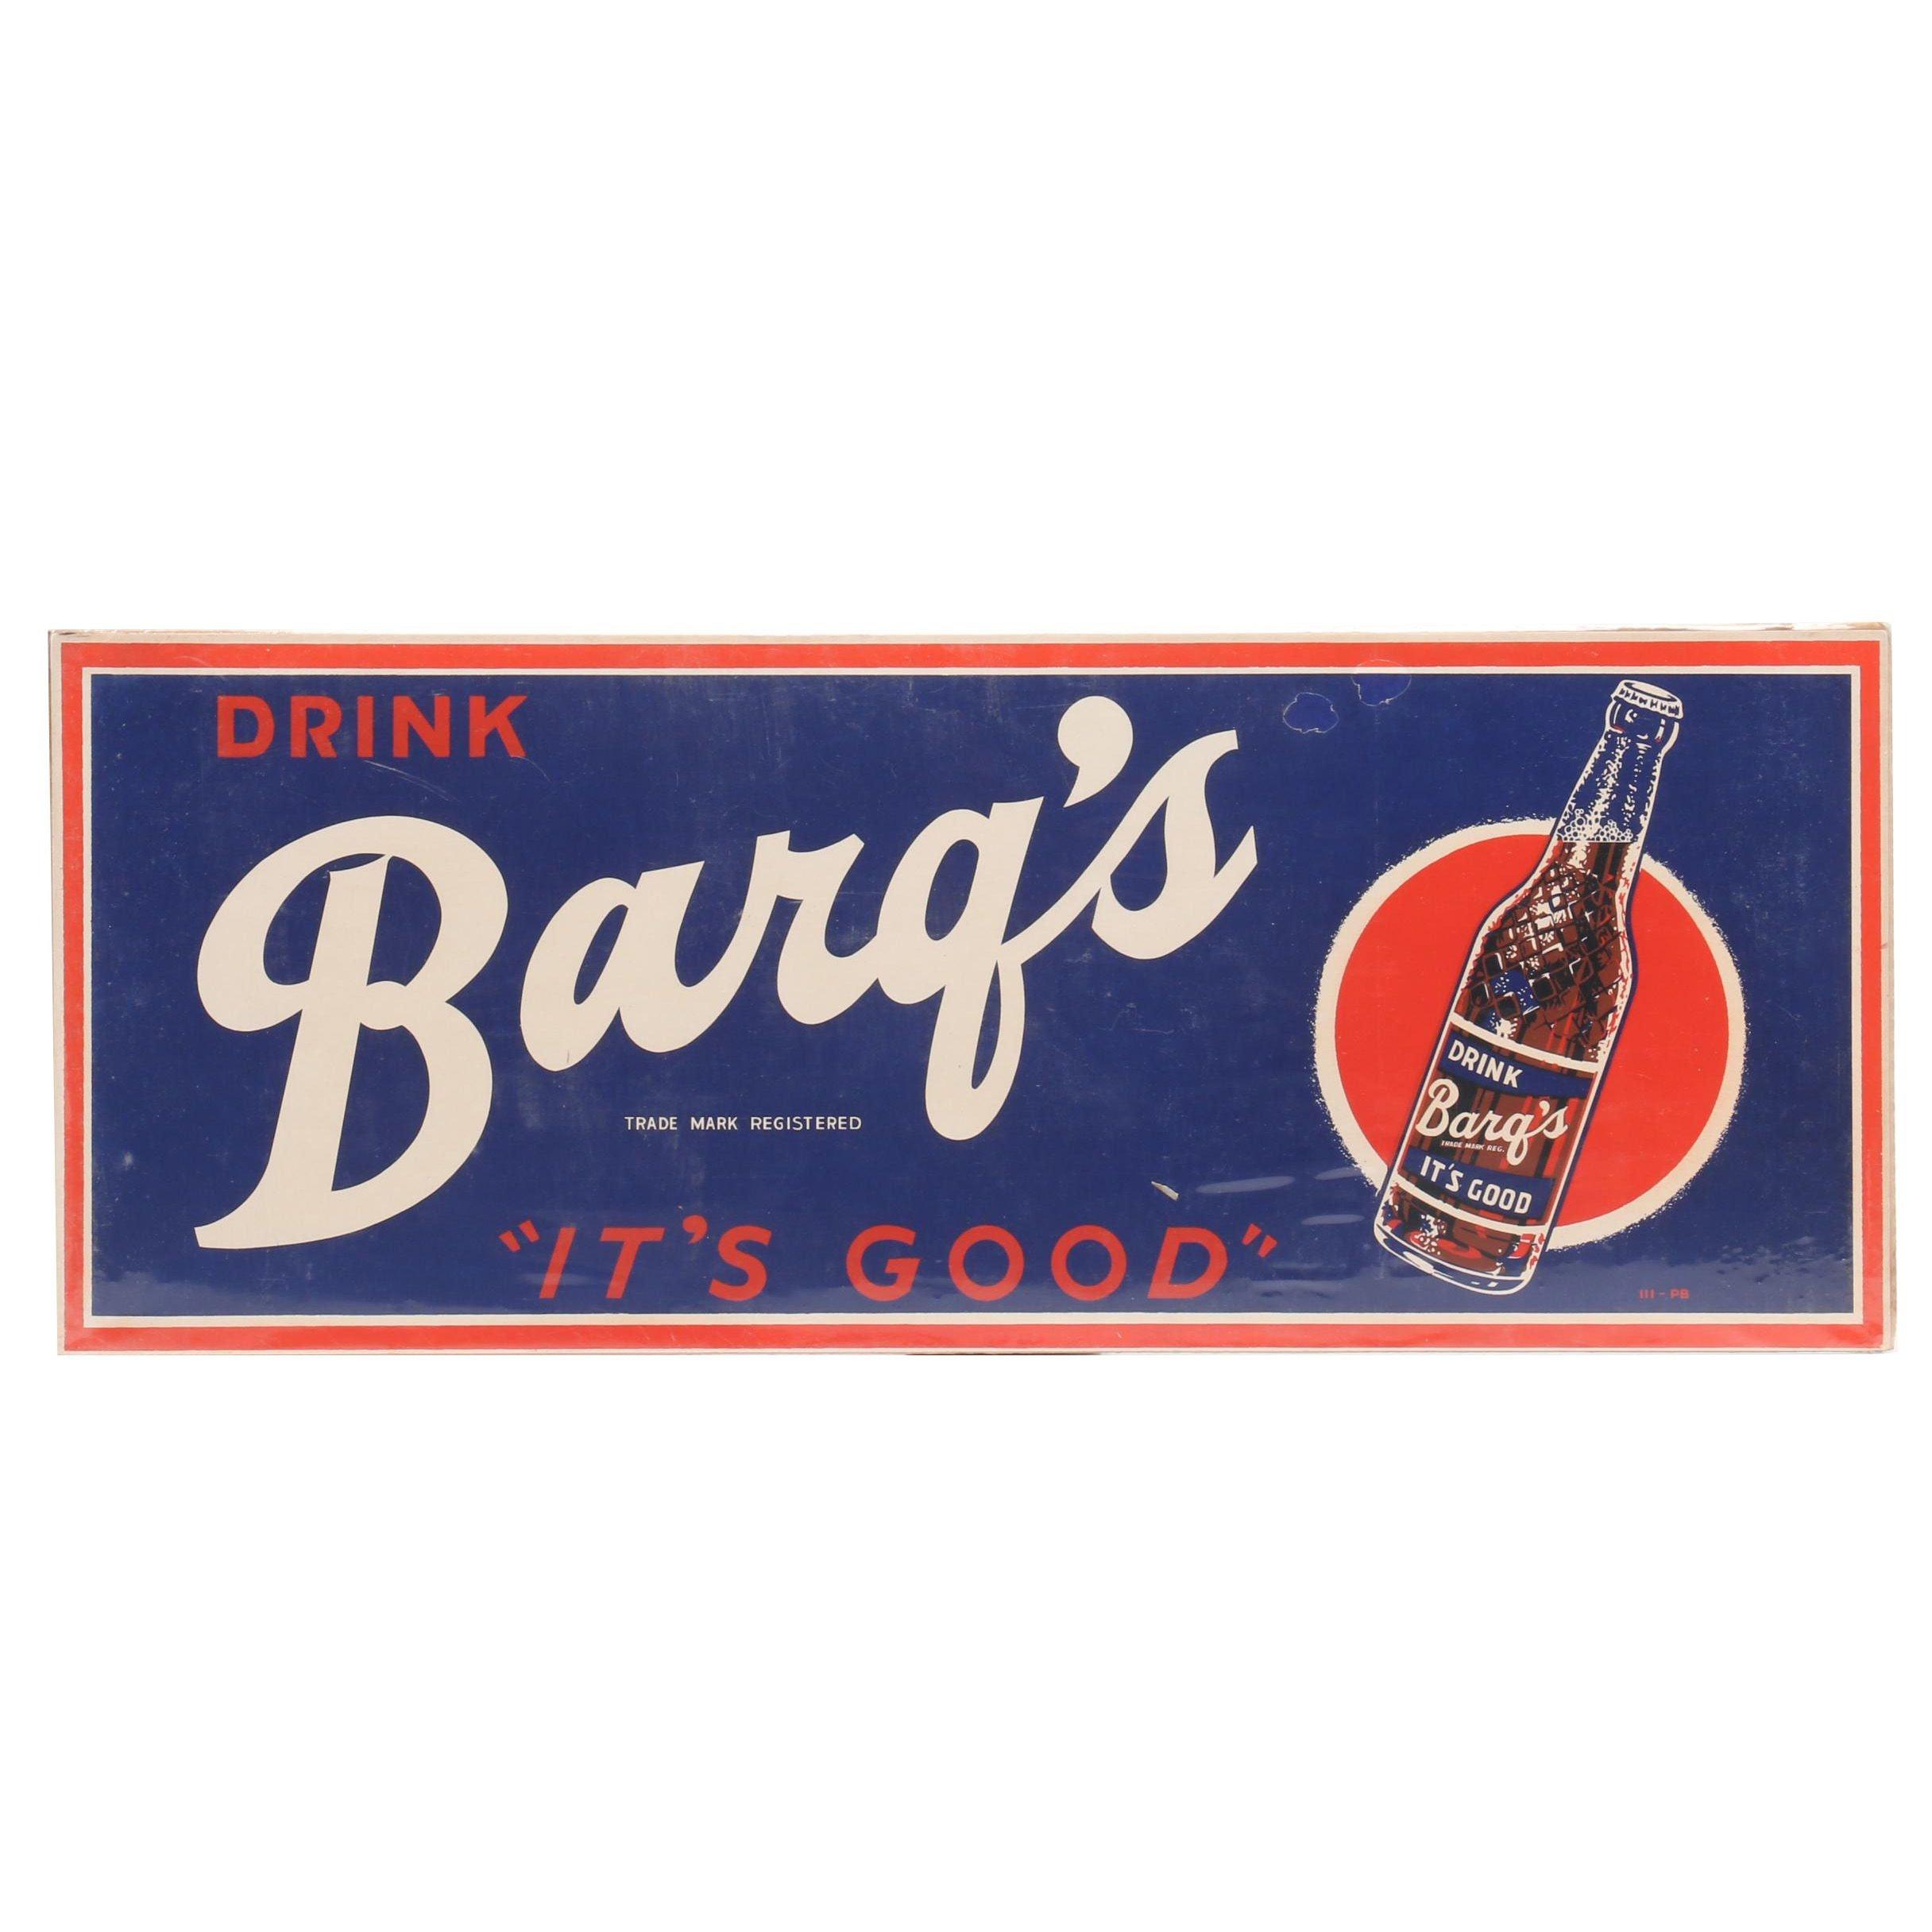 Barq's Root Beer Cardboard Advertising Vendor Sign, Circa 1950s